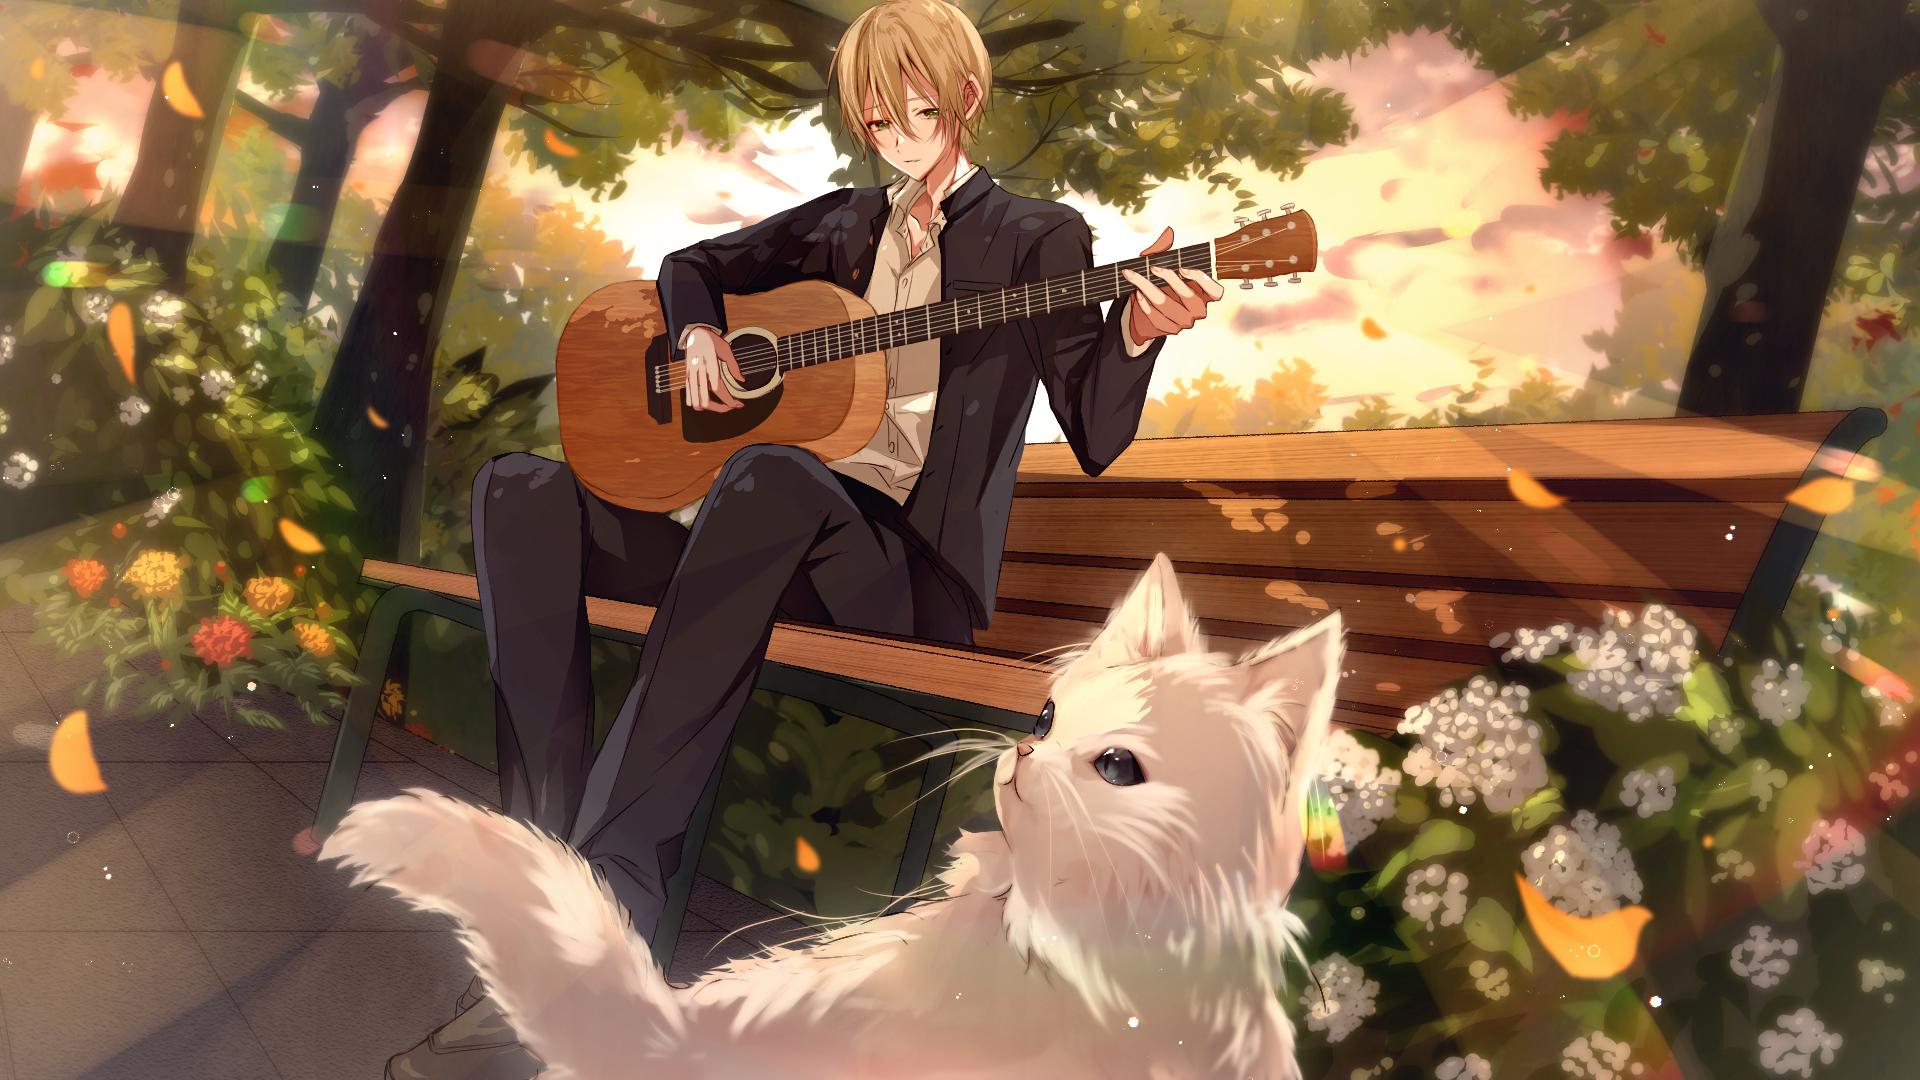 Anime Boy Playing Guitar Wallpaper, HD Anime 4K Wallpapers ...